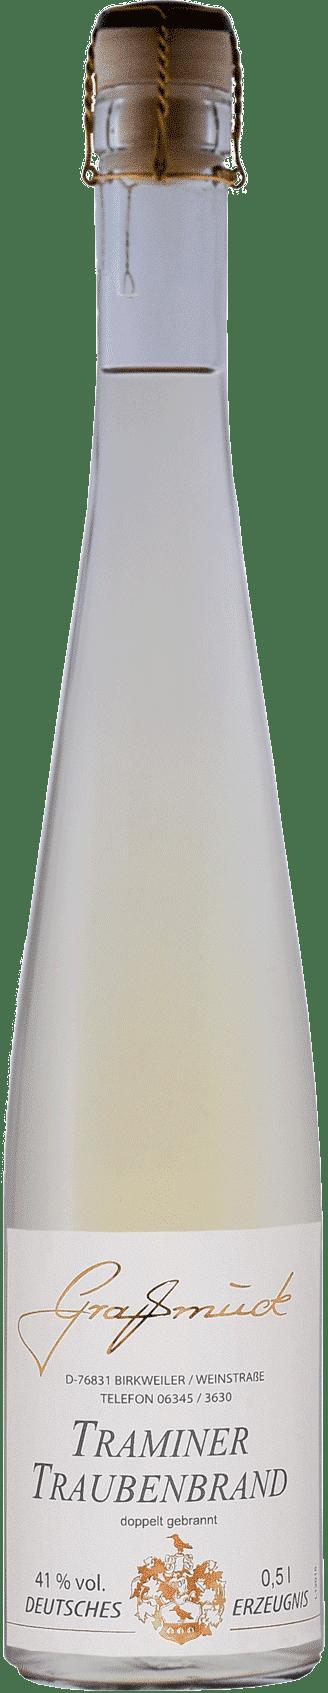 Weingut Ludwig Graßmück, Simon Graßmück, Traminer Traubenbrand